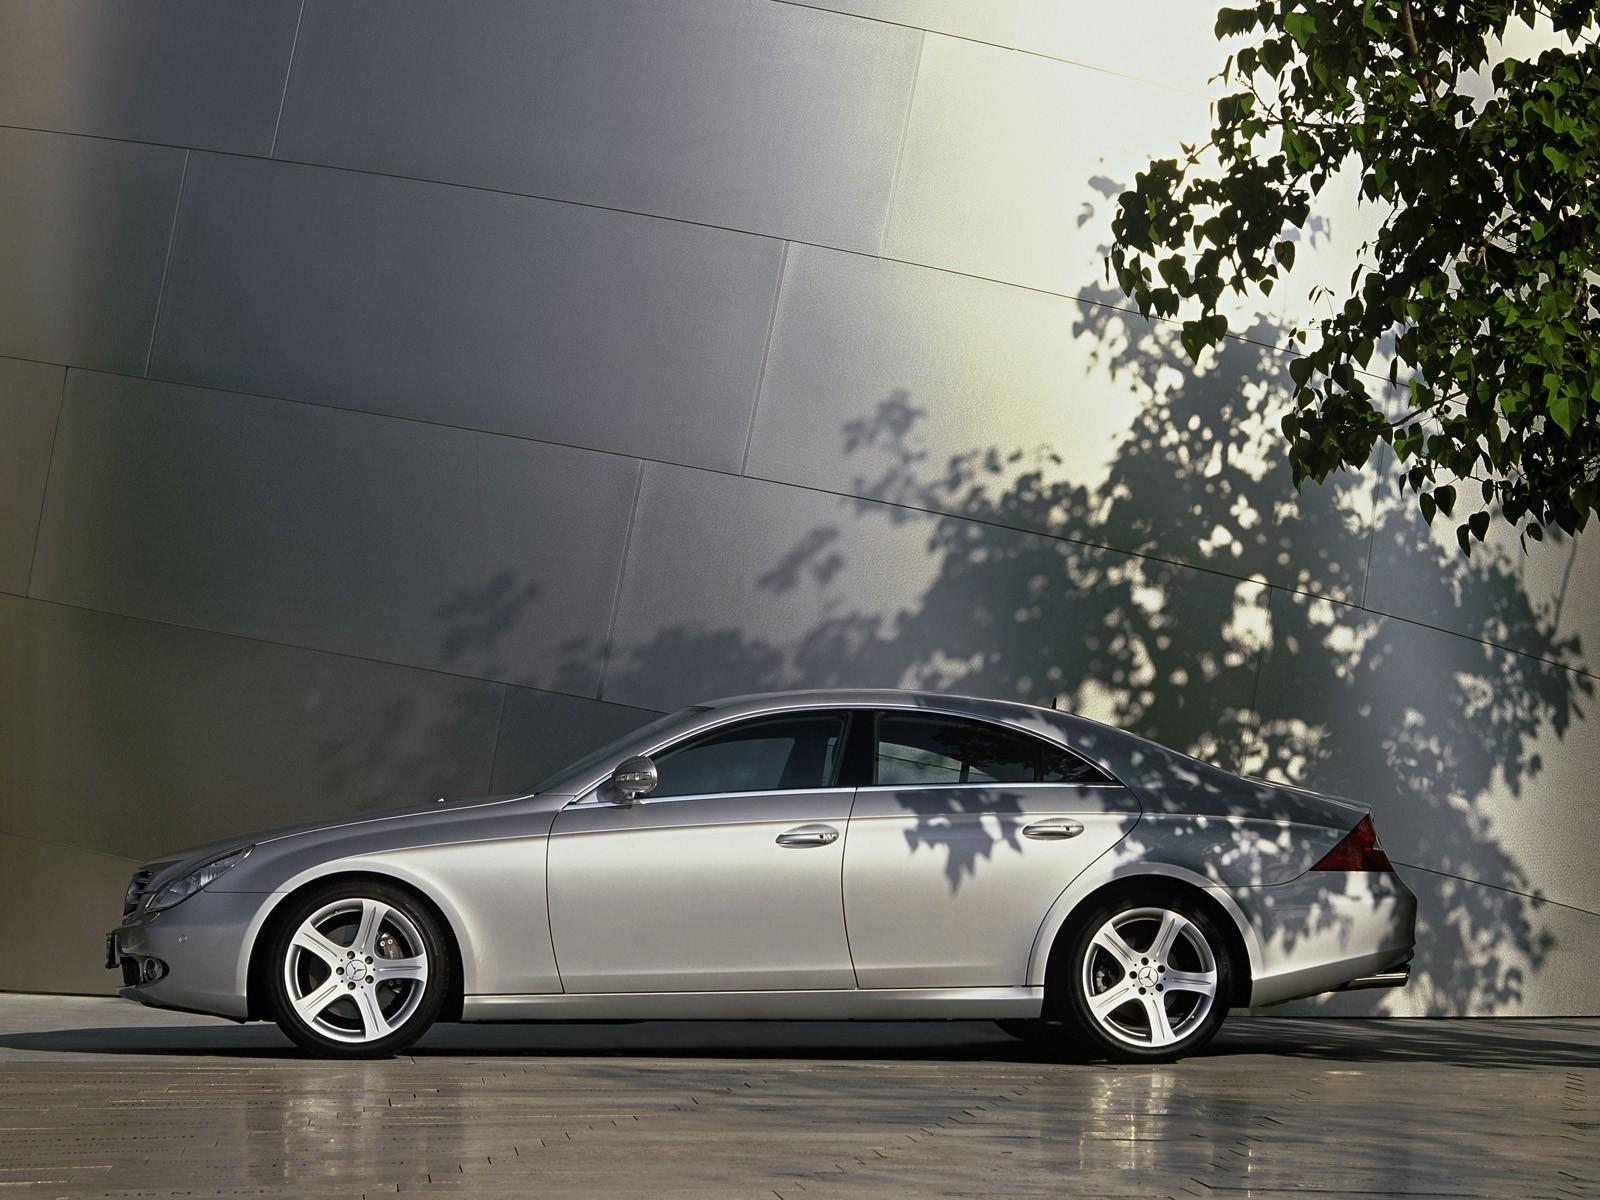 Car dinal mercedes benz cls top class cars model mercedes cls for Best mercedes benz model